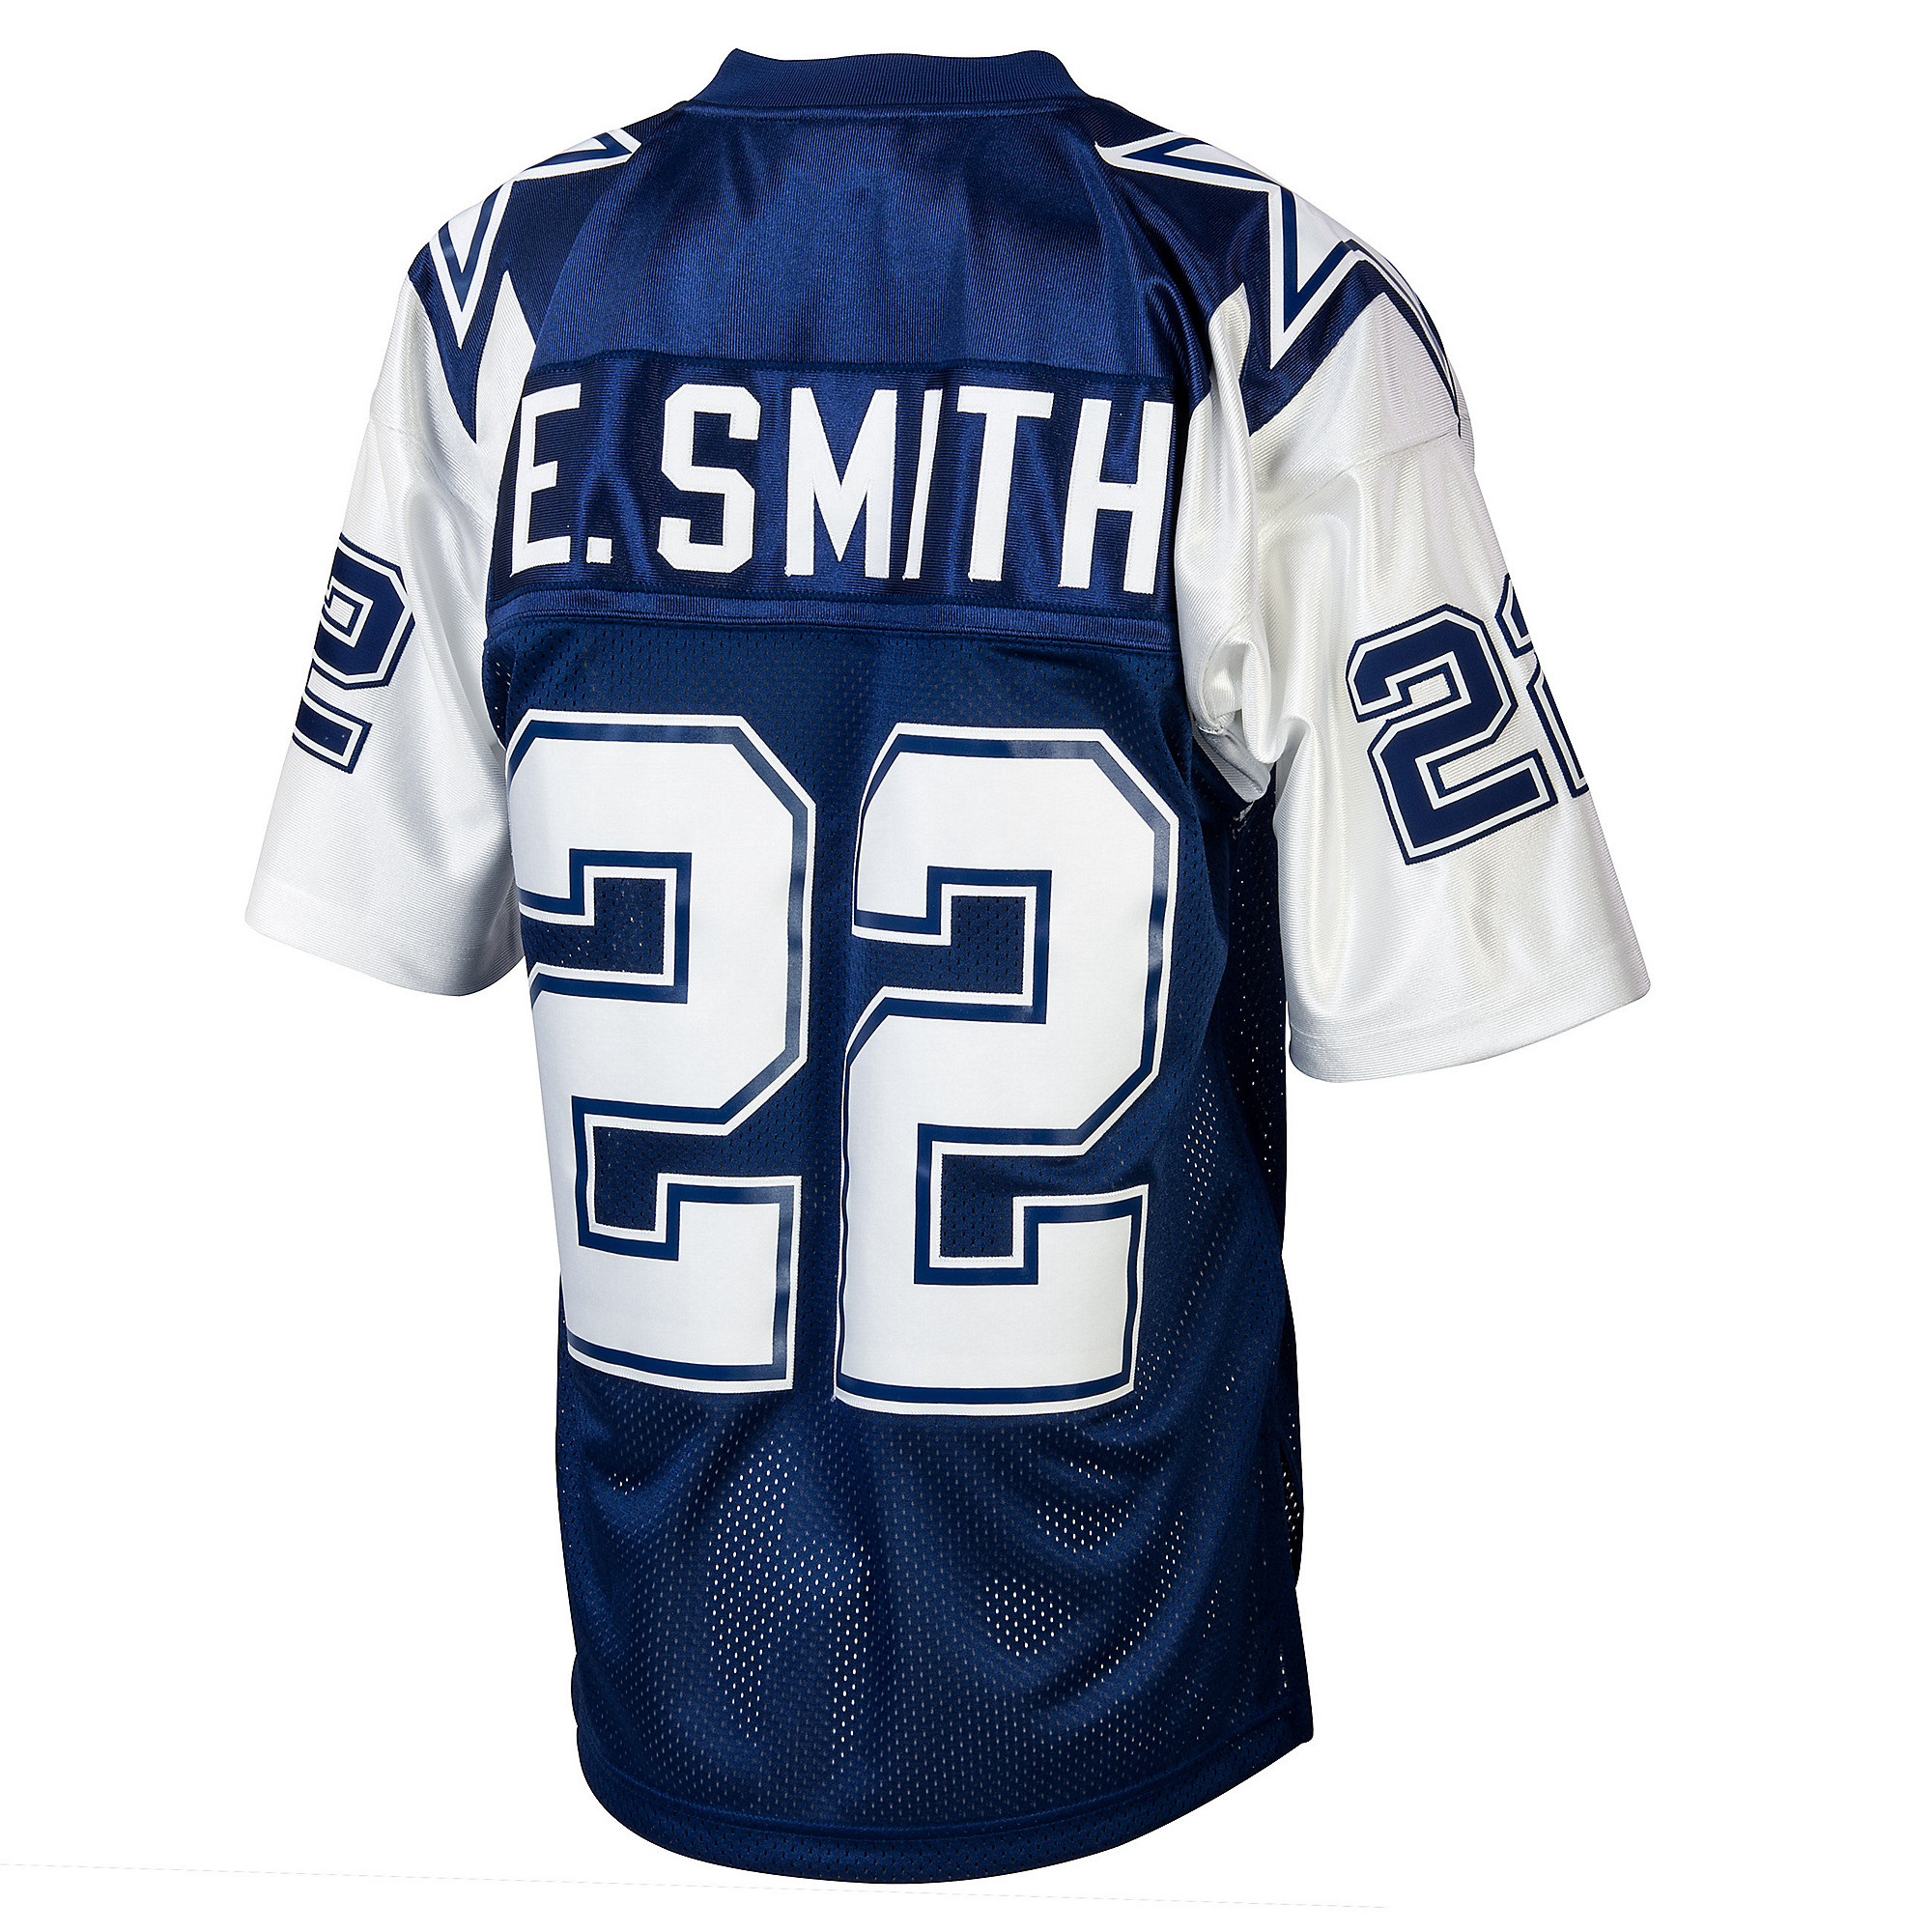 official photos 66404 5ac30 Dallas Cowboys Emmitt Smith 1995 Mitchell & Ness Double Star Jersey |  Dallas Cowboys Pro Shop